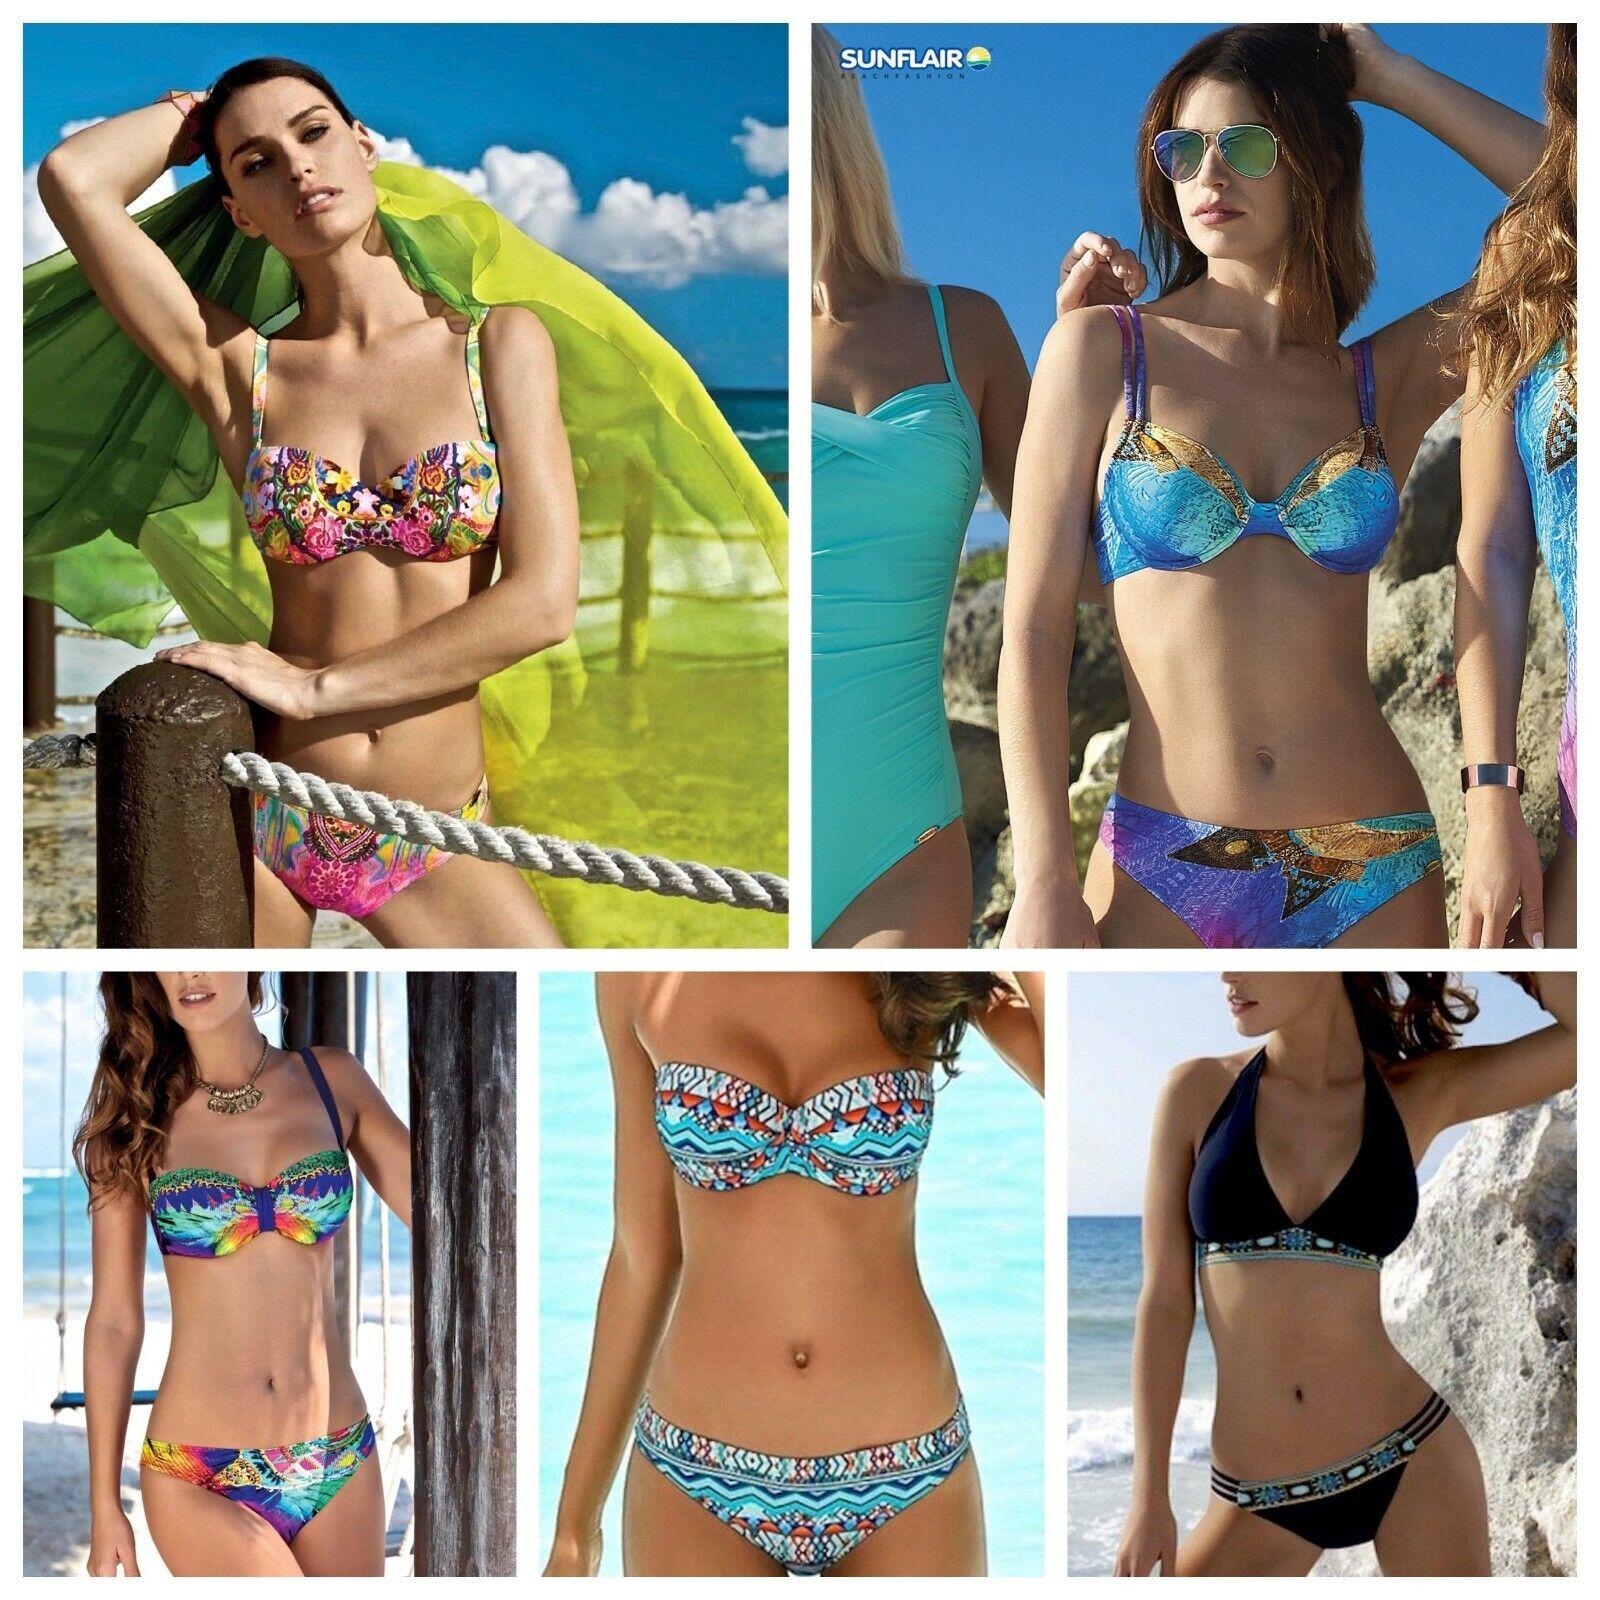 Sunflair Damen Bikini-Set LYCRA® XTRA LIFE™ UV-Schutz 50+ Gr. 36-46 Cup B-G neu